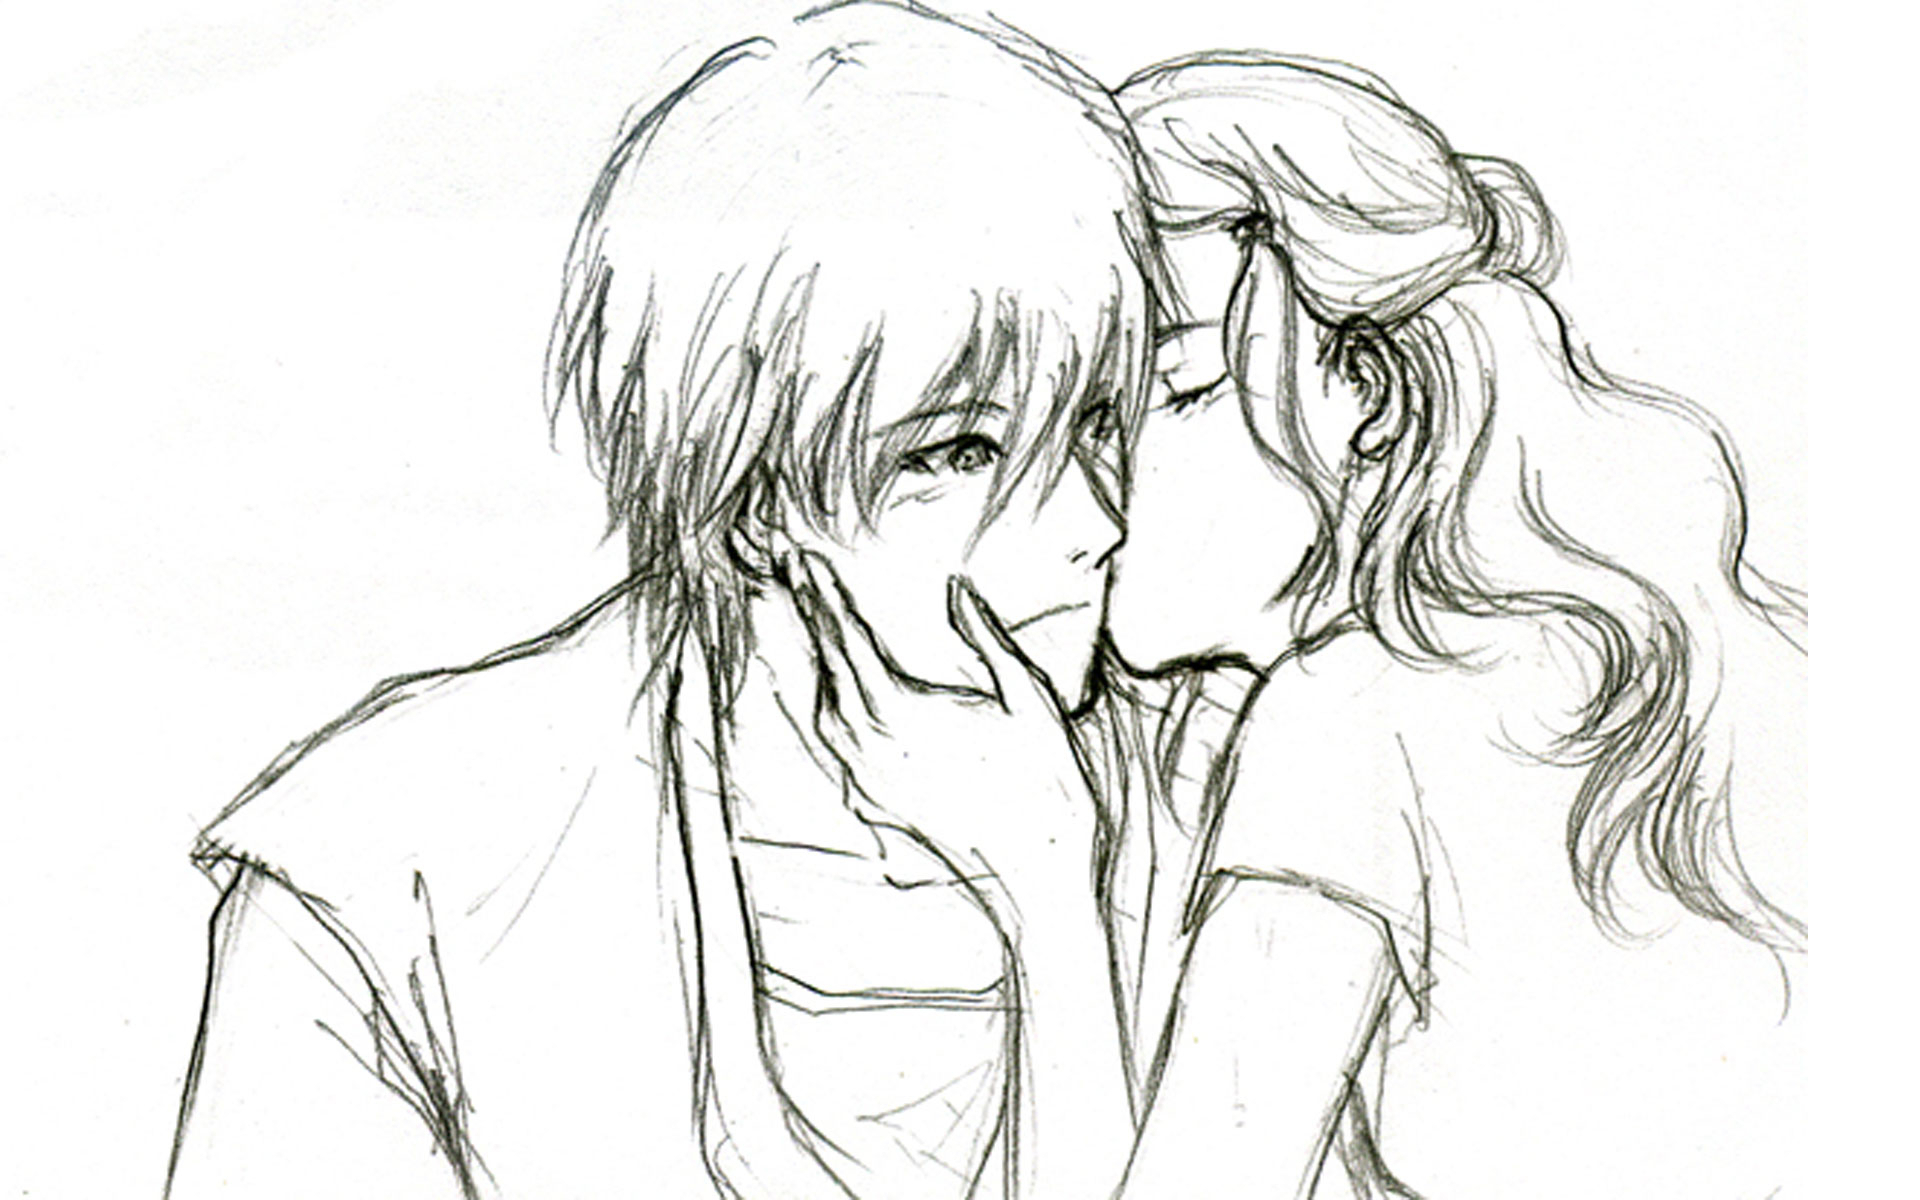 1920x1200 Boy Amp Girl Kiss To Hand Sketch Image Easy Girl And Boy Kiss